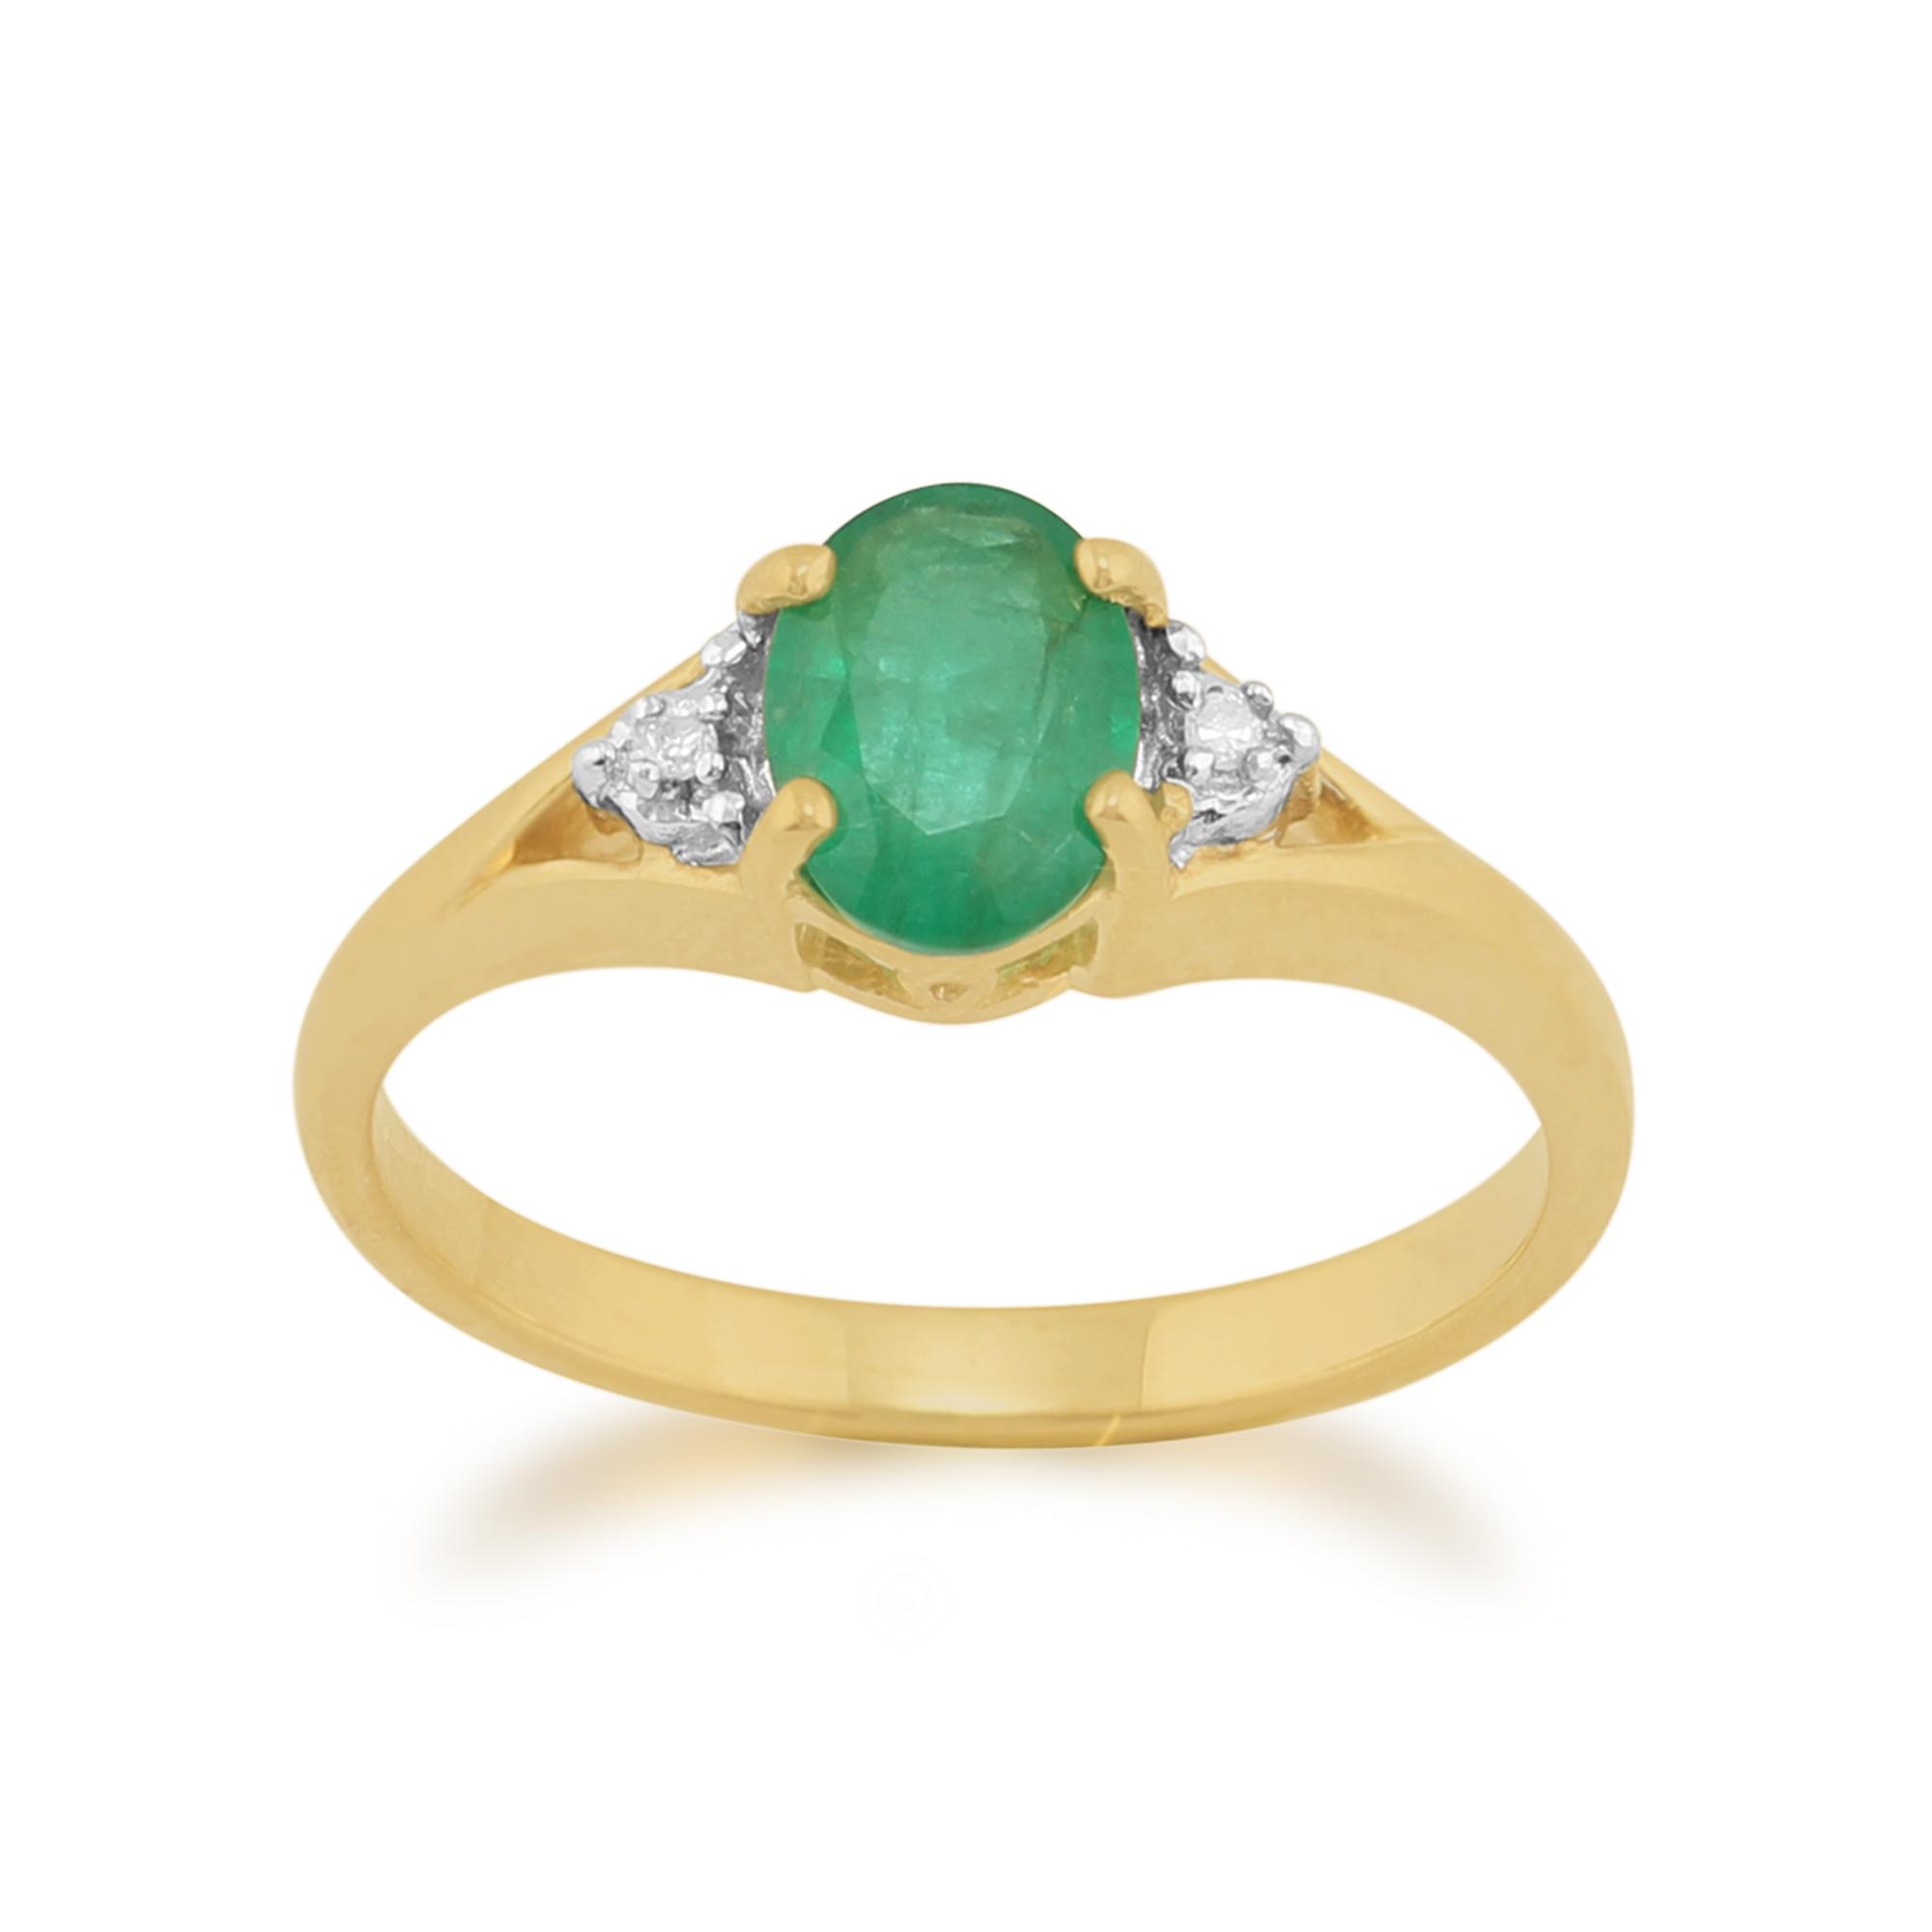 9ct Yellow Gold 0.75ct Natural Emerald & Diamond Single Stone Ring Size: L